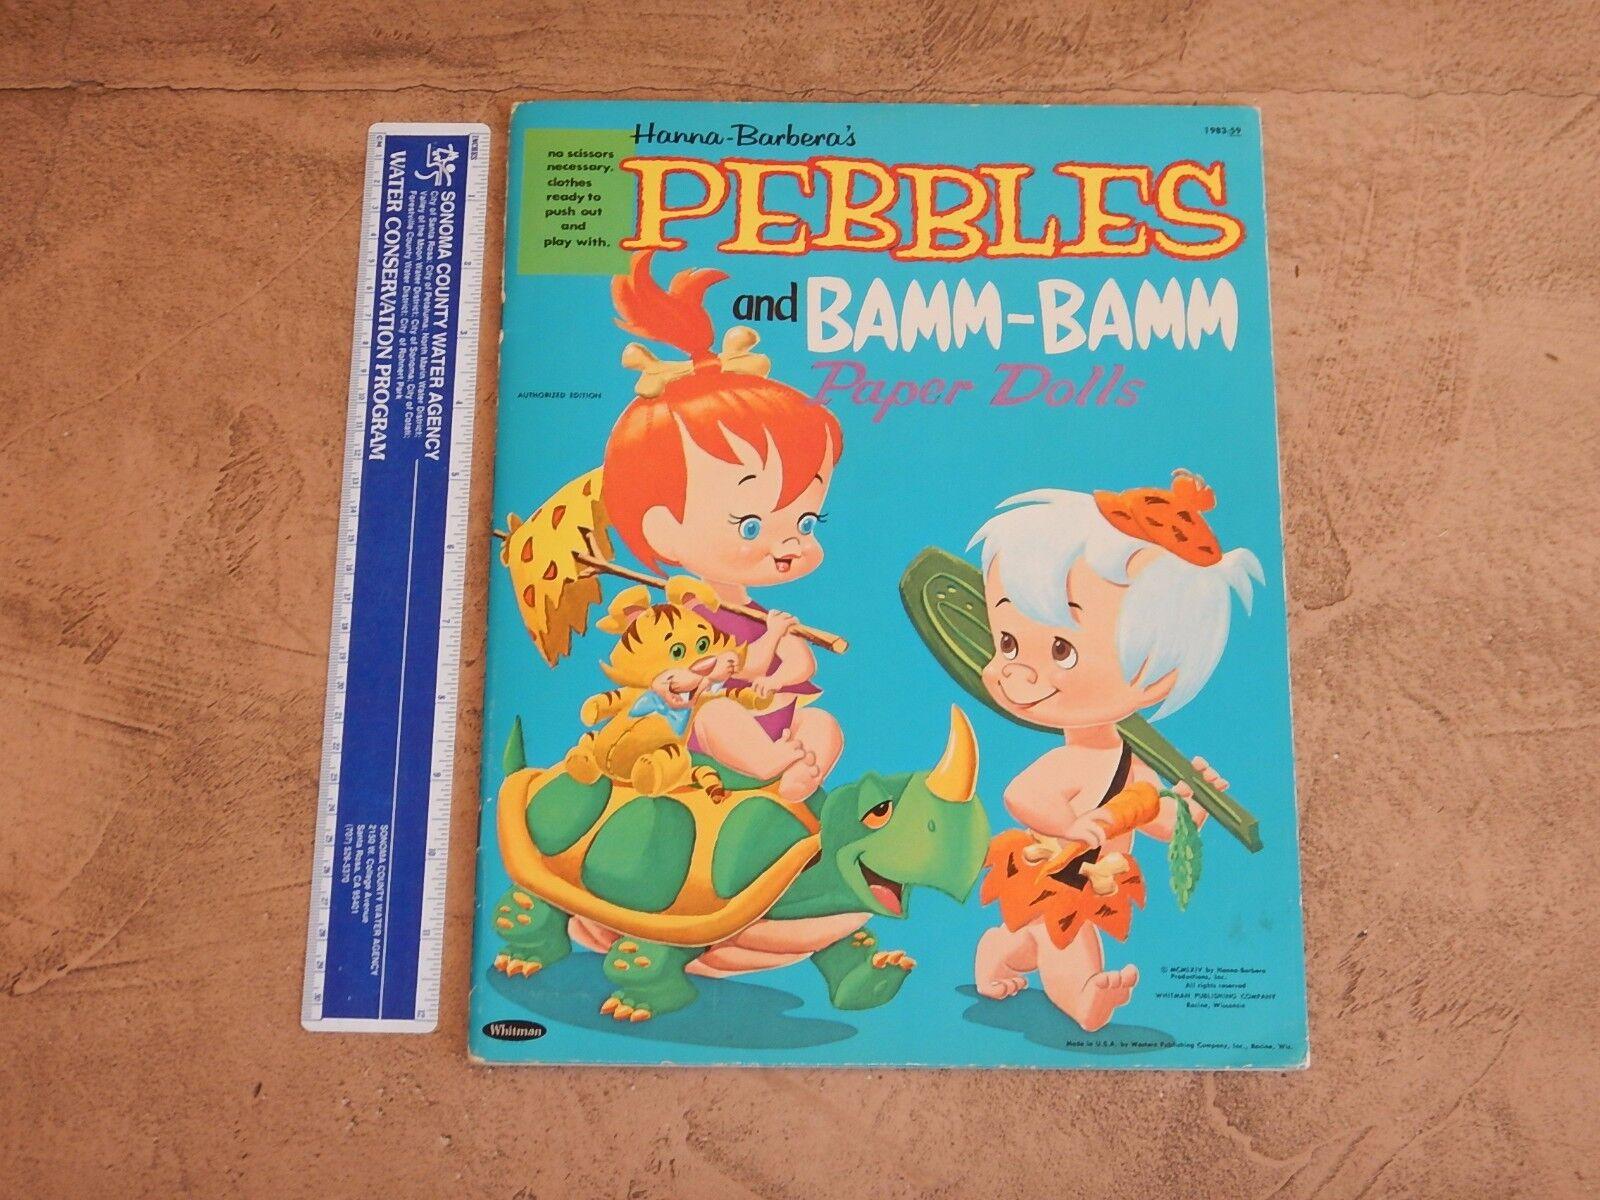 1964 HANNA BARBERA PEBBLES AND BAMM-BAMM PAPER DOLLS BOOK  HIGH GRADE UNUSED